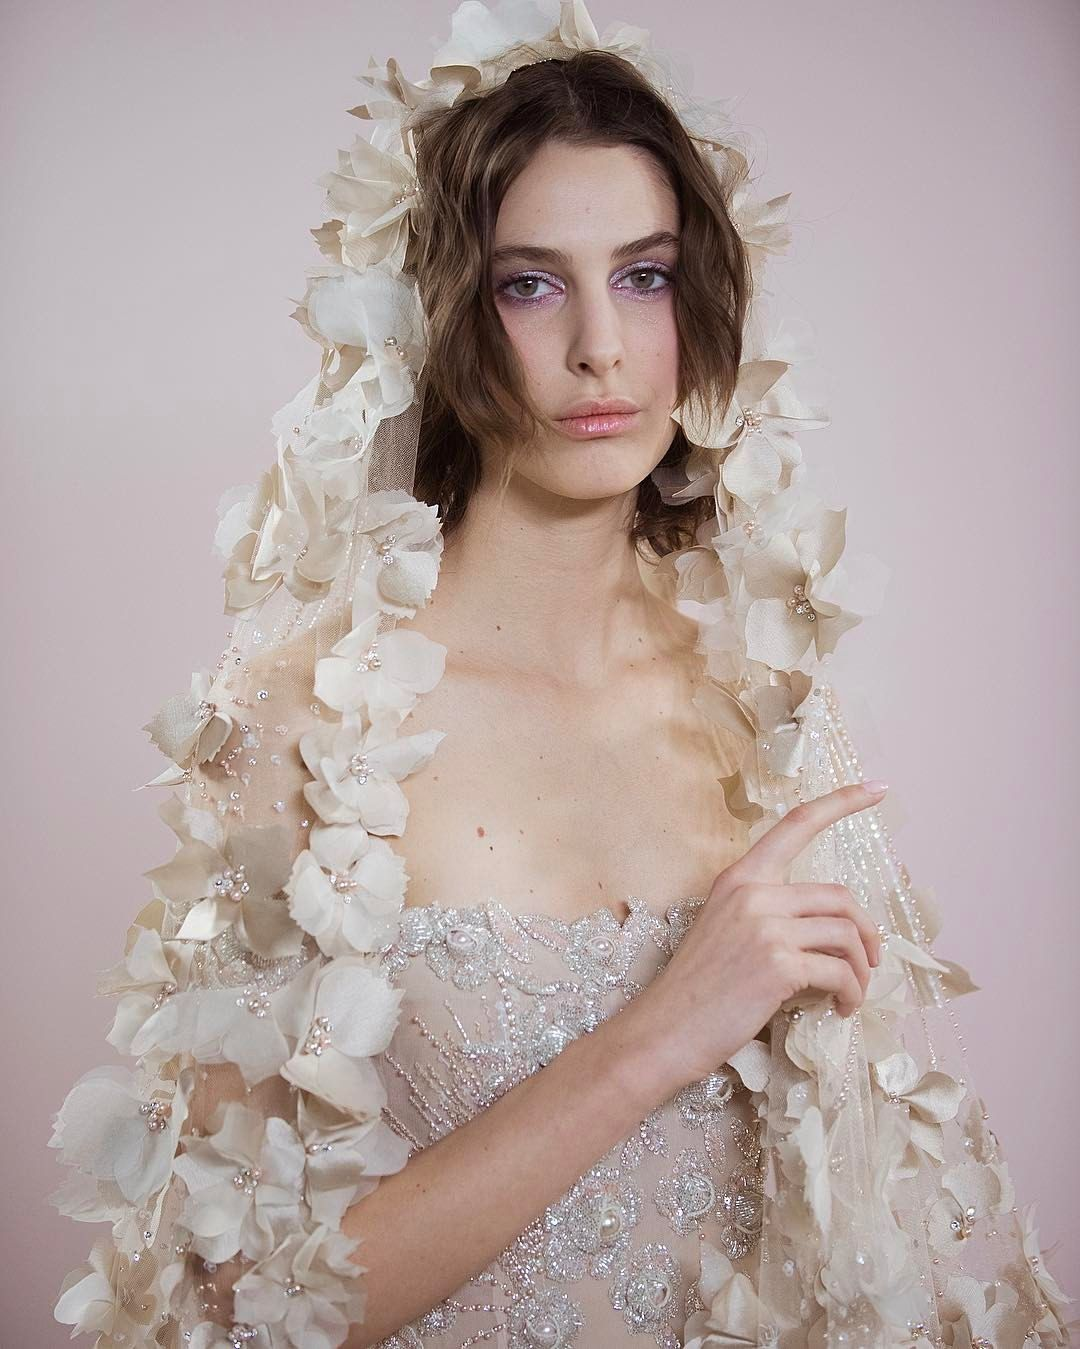 Georges hobeika luxury bridal veil whimsical highly textured bliss